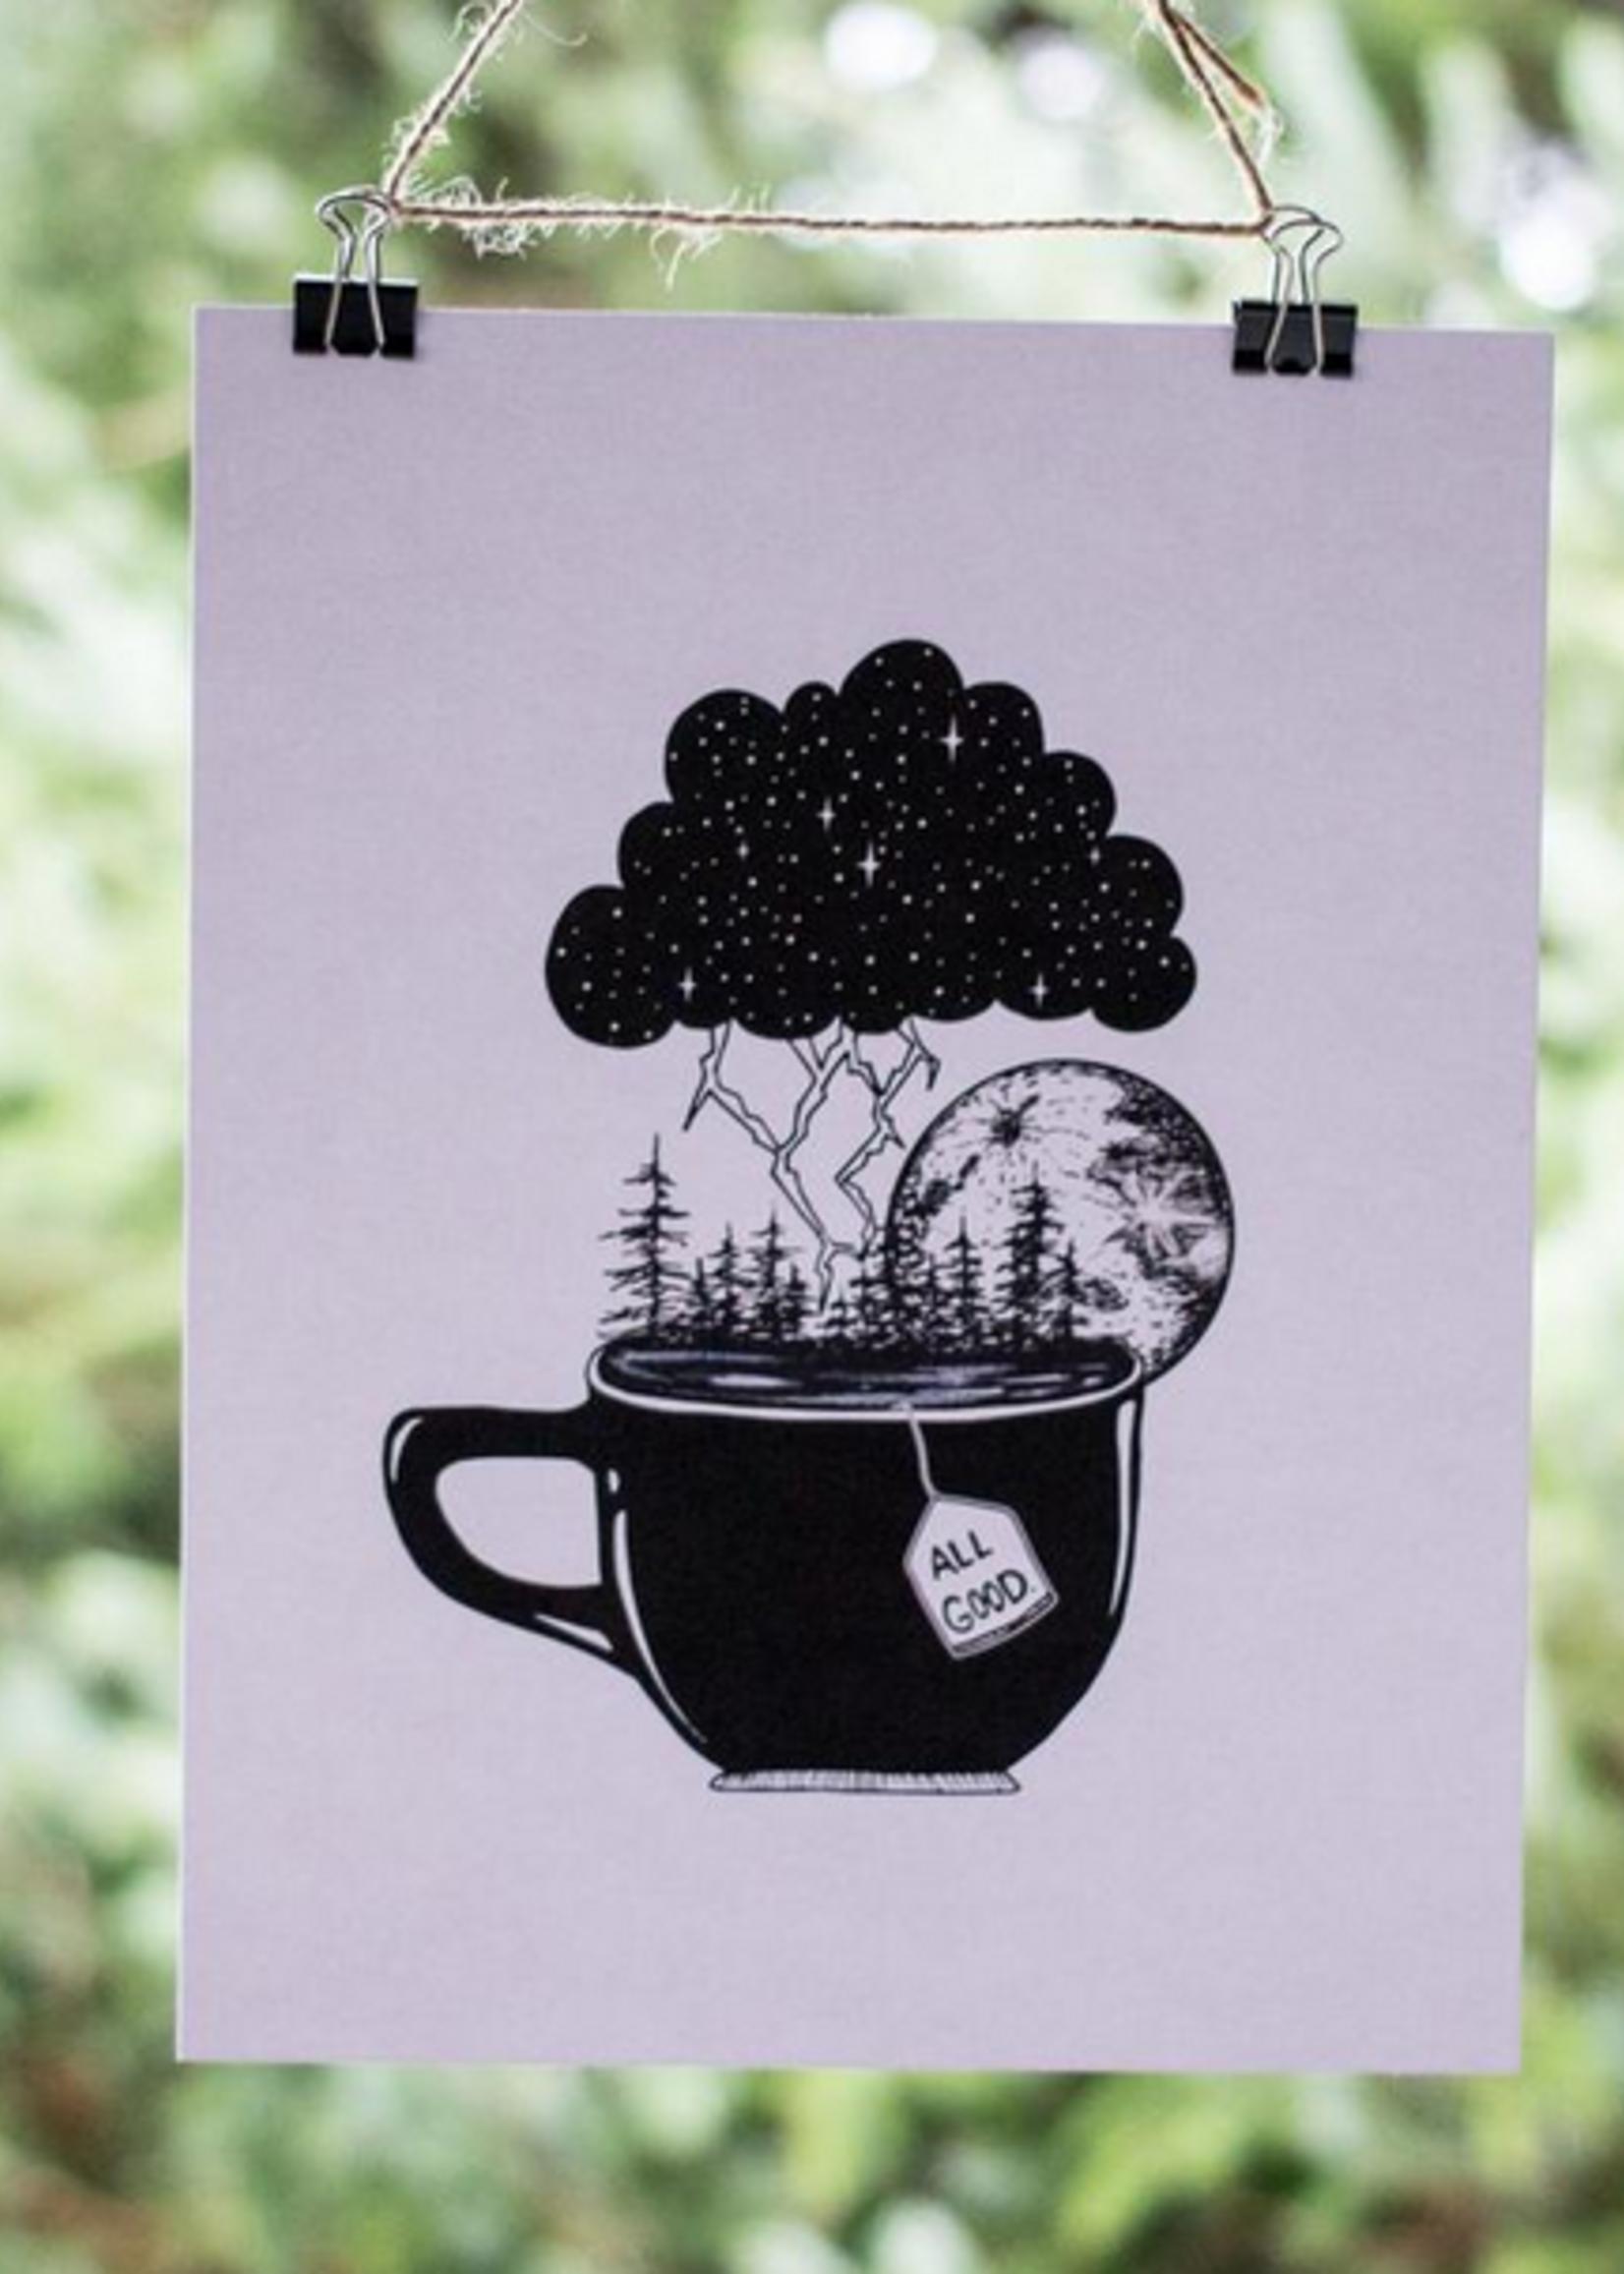 MELINA/KIMBERLEY BC MELINA ART PRINT ALL GOOD TEA